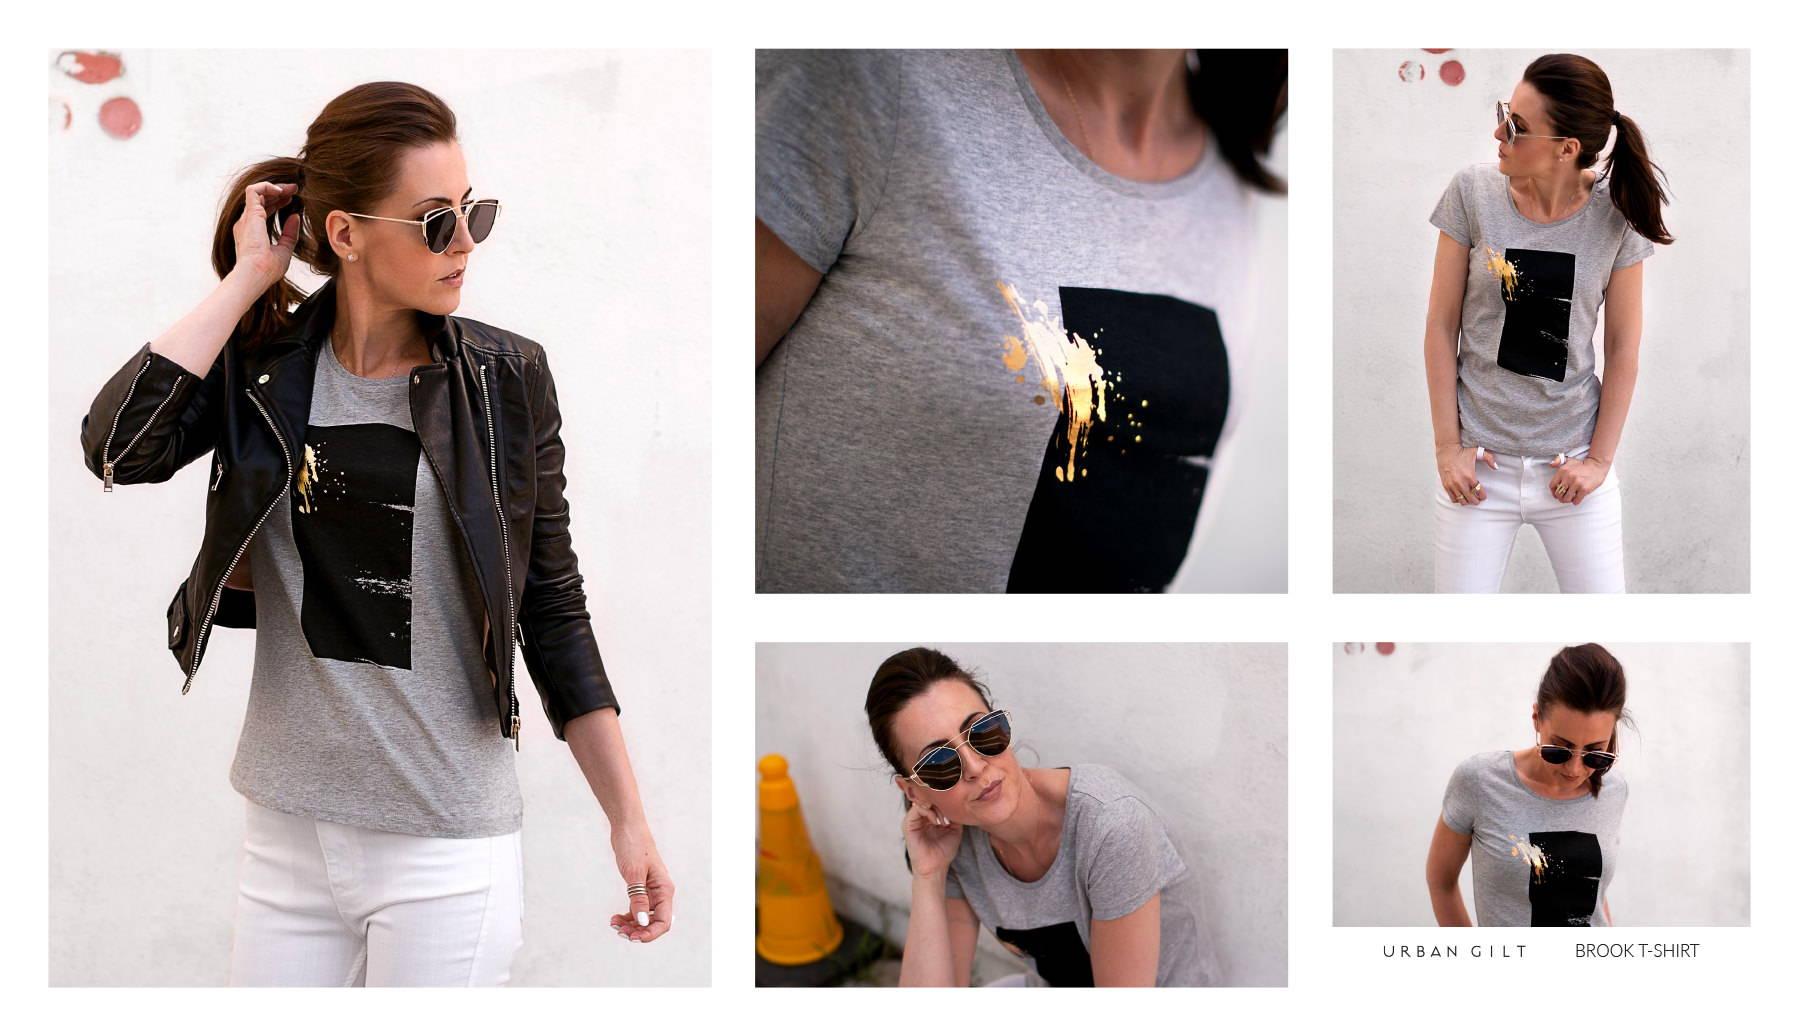 Urban Gilt Lookbook | Uptown Style | Brook T-shirt